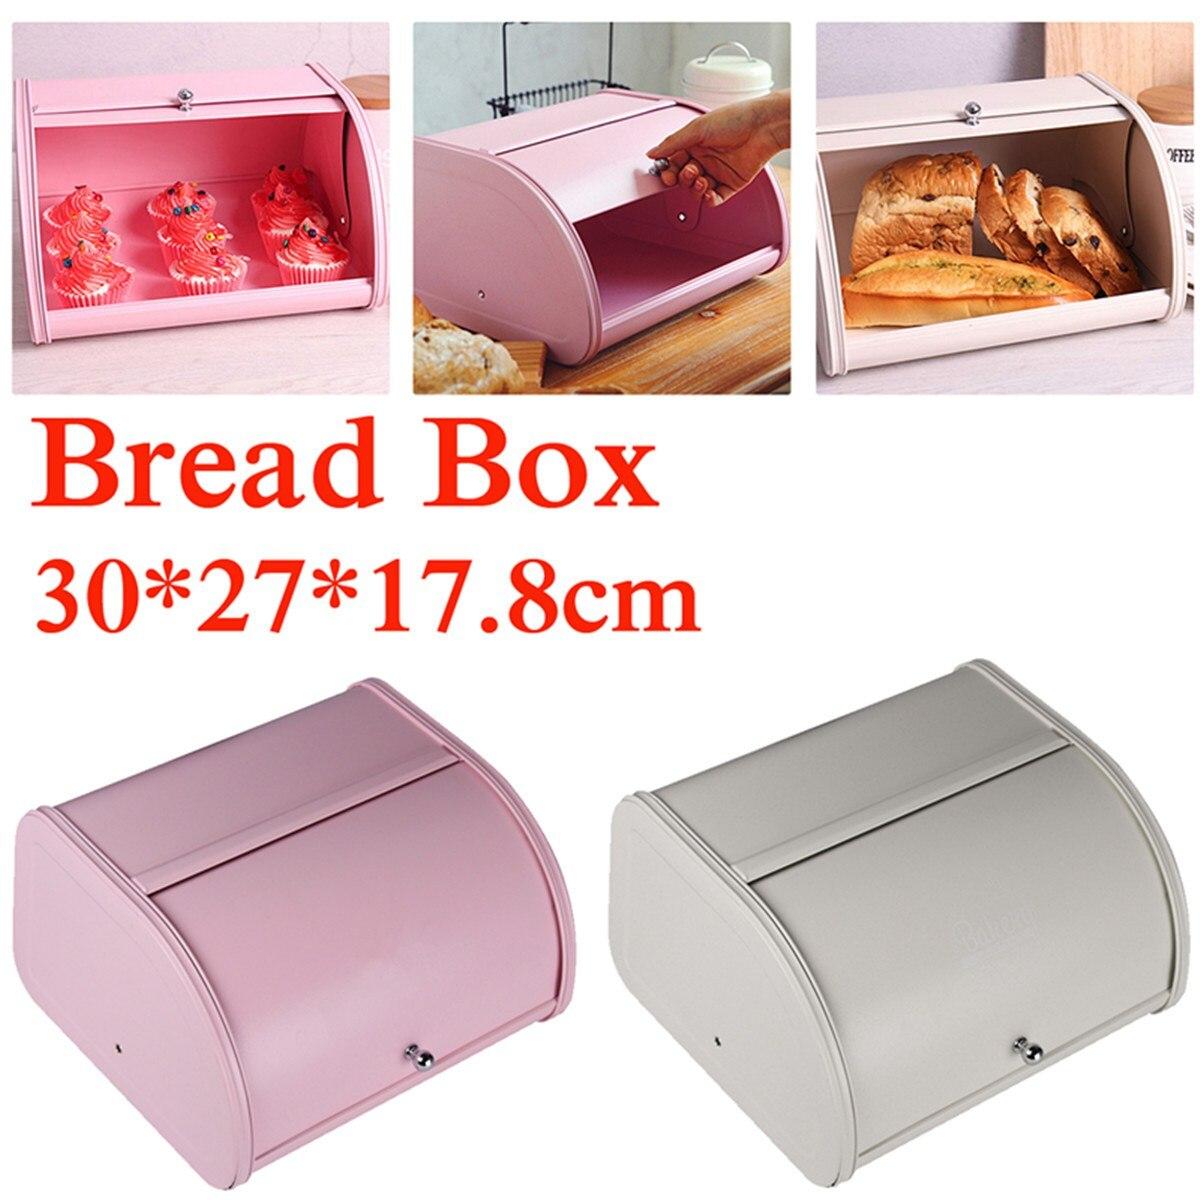 bread box Fine iron food storage container breakfast for kitchen Solid Continental stora ...